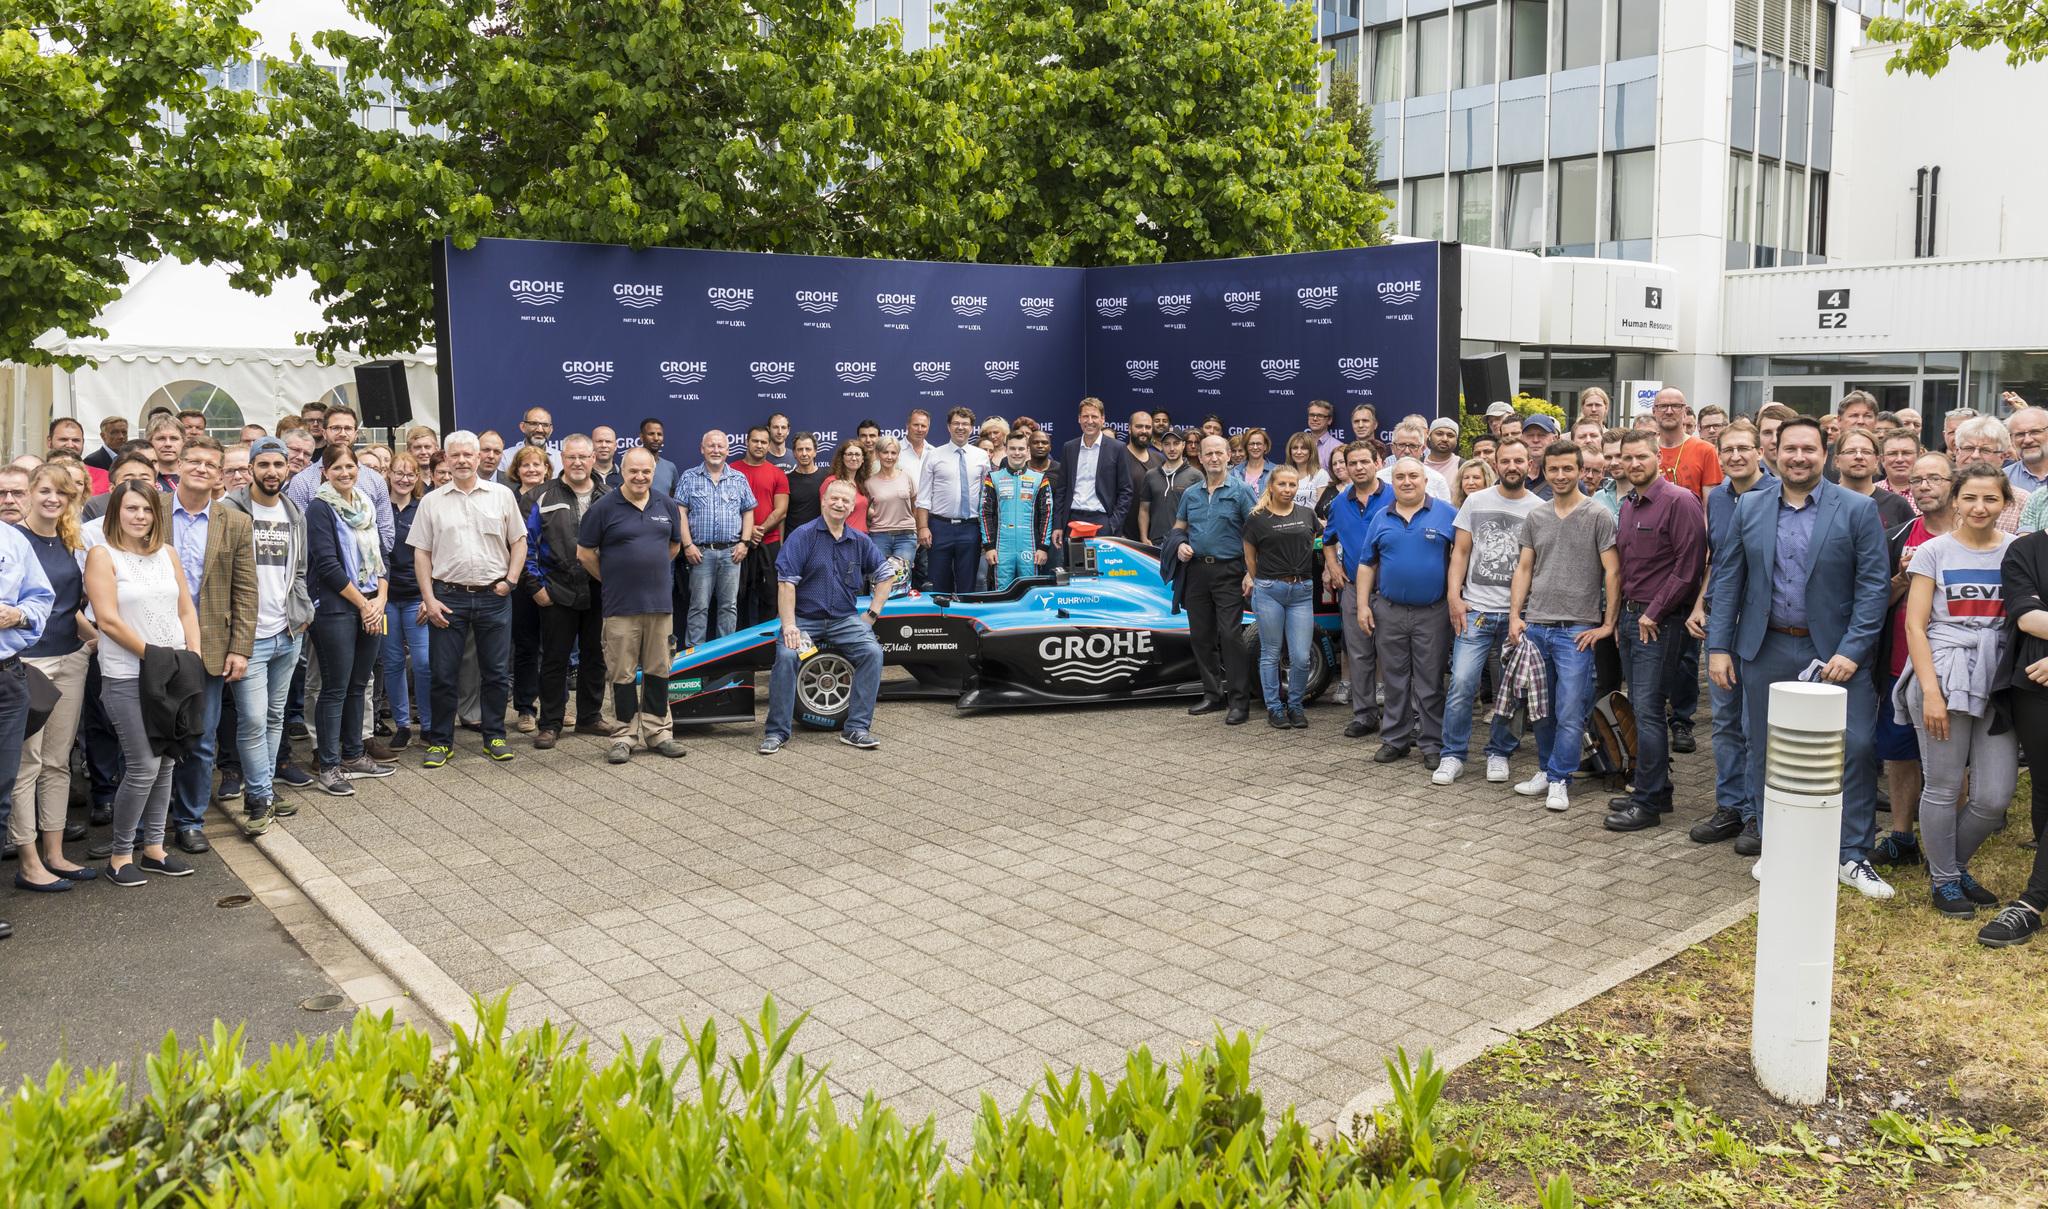 Race Driver David Beckmann visits GROHE in Hemer, Germany